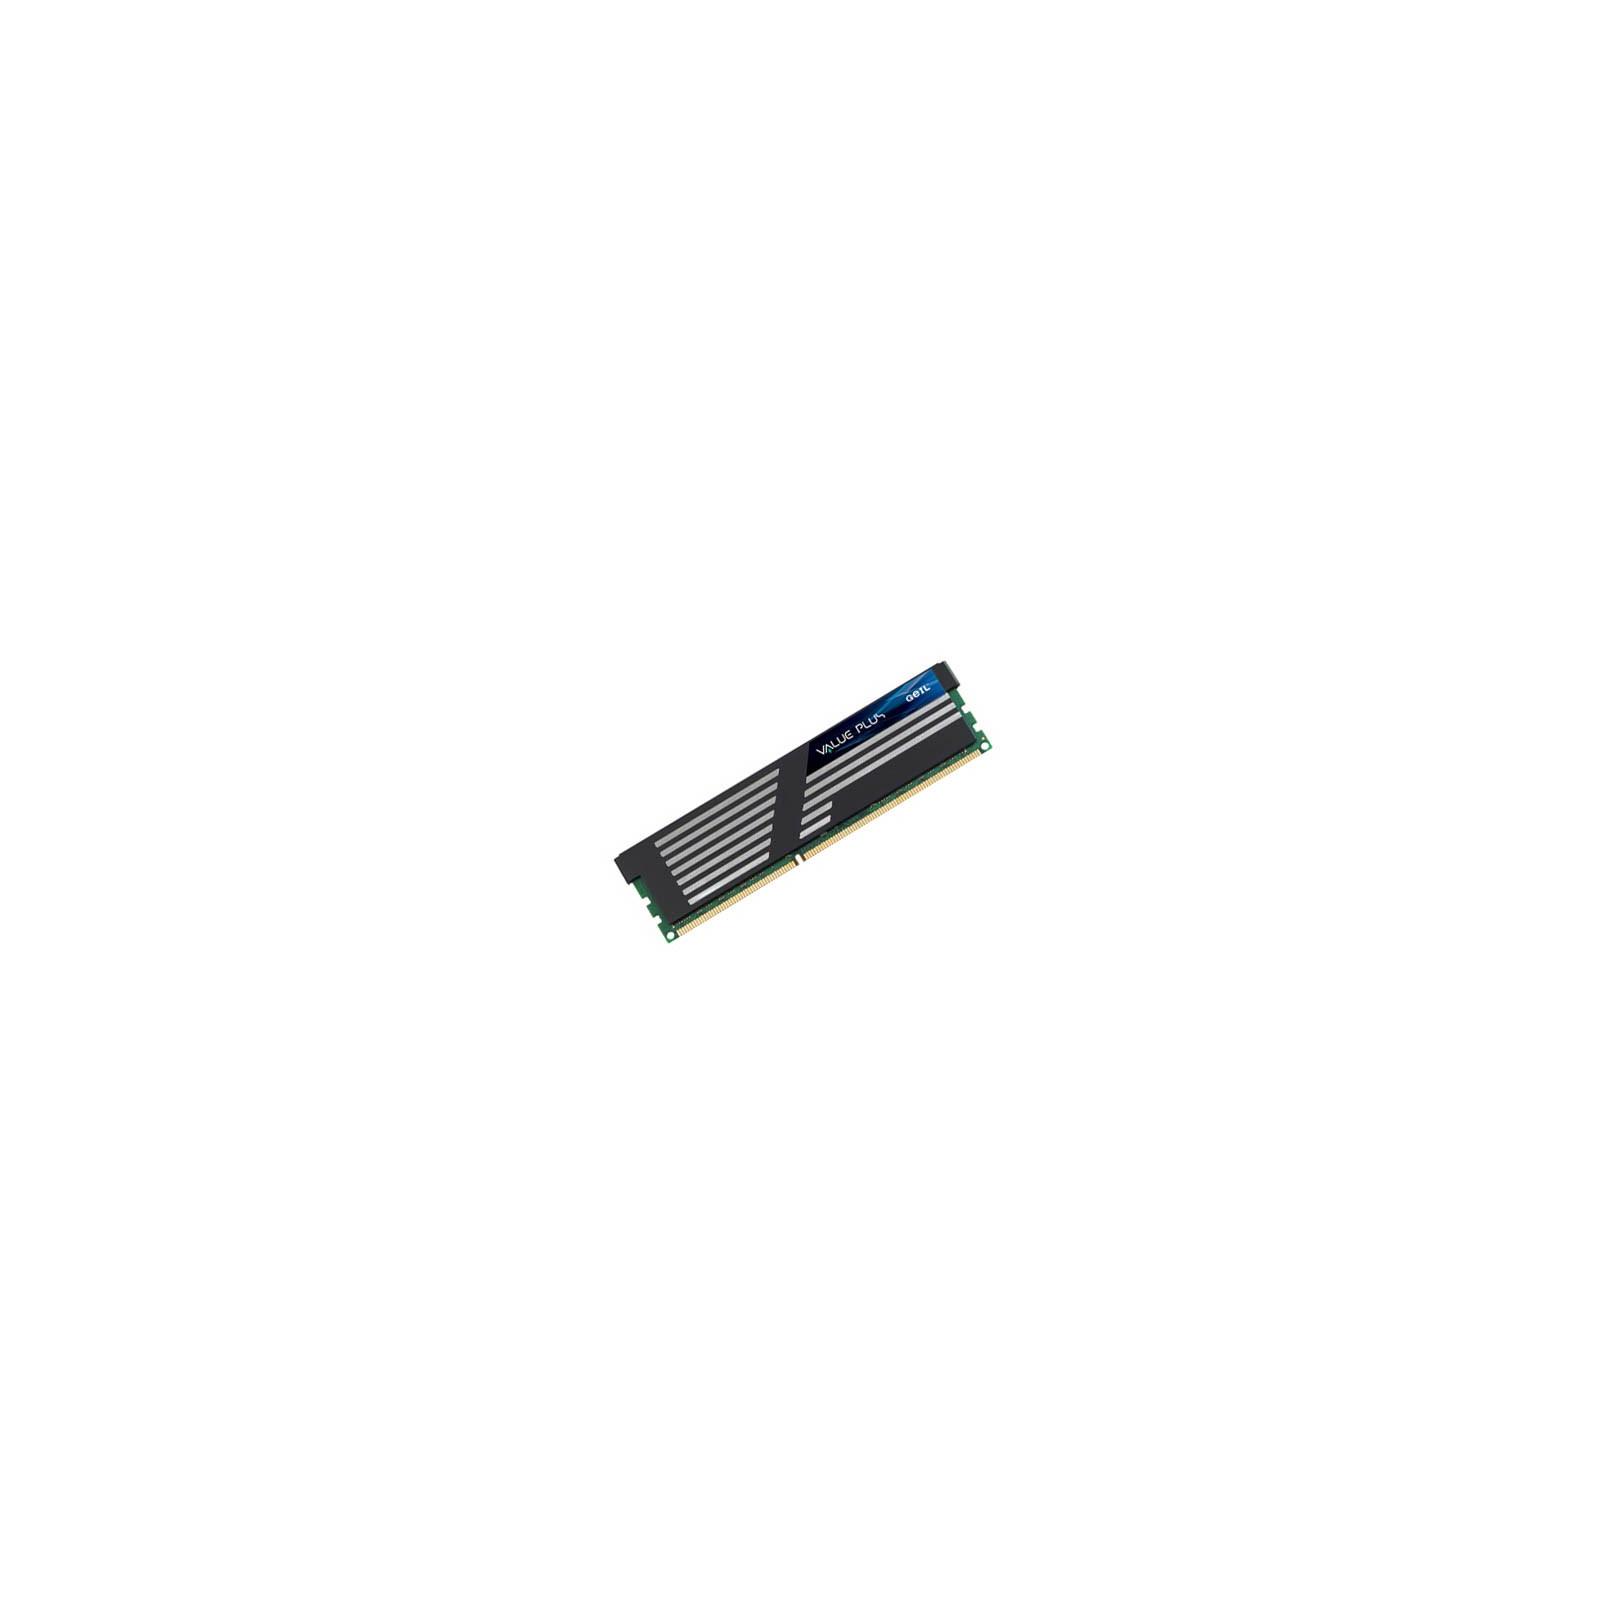 Модуль памяти для компьютера DDR3 4GB 1600 MHz GEIL (GVP34GB1600C9SC)